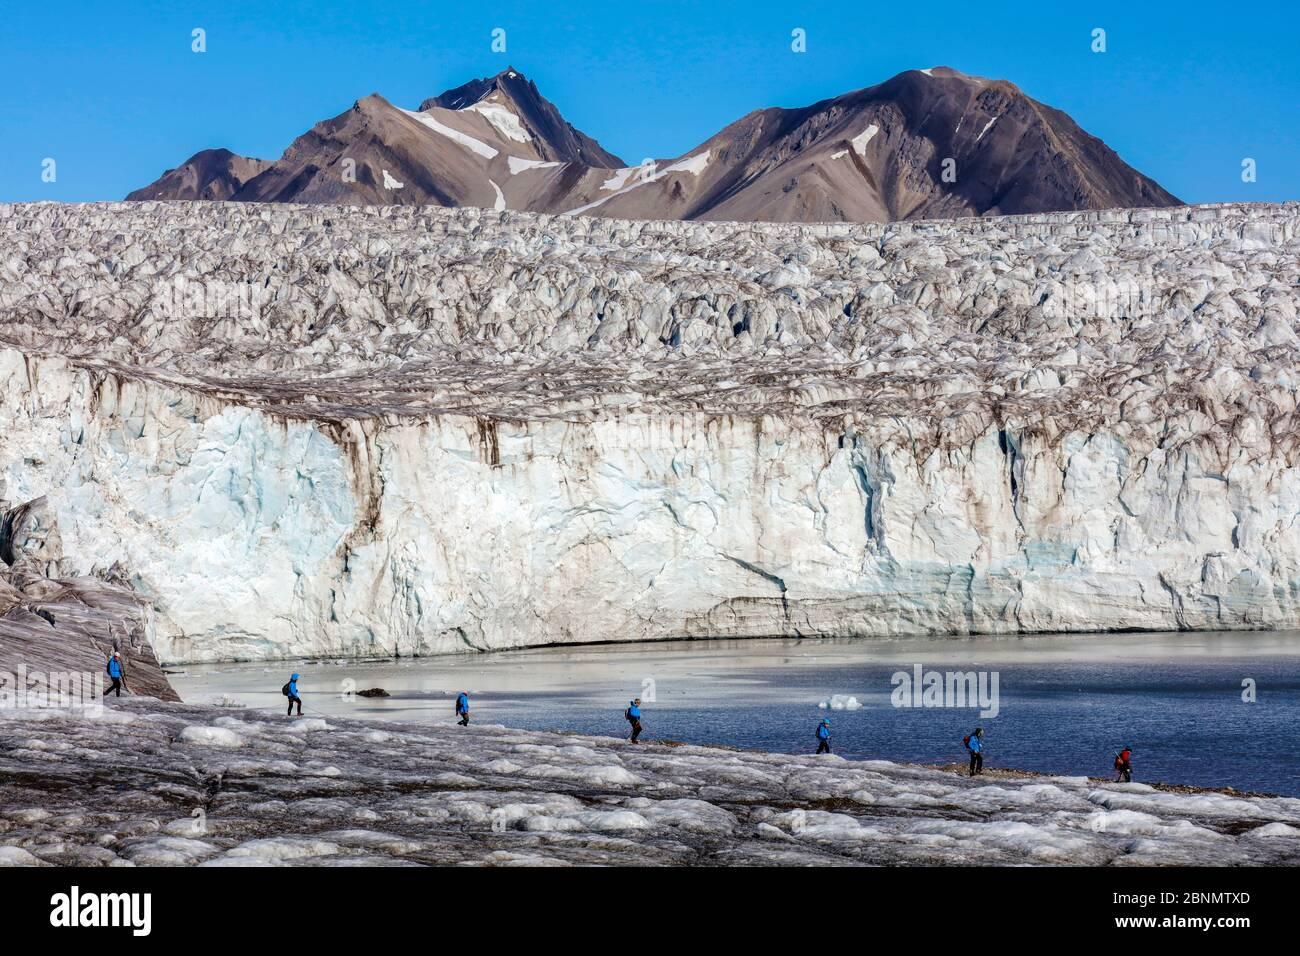 Les gens de la randonnée sur glacier, Esmarkbreen glacier, Isfjorden, Svalbard, Norvège, juillet 2016. Banque D'Images